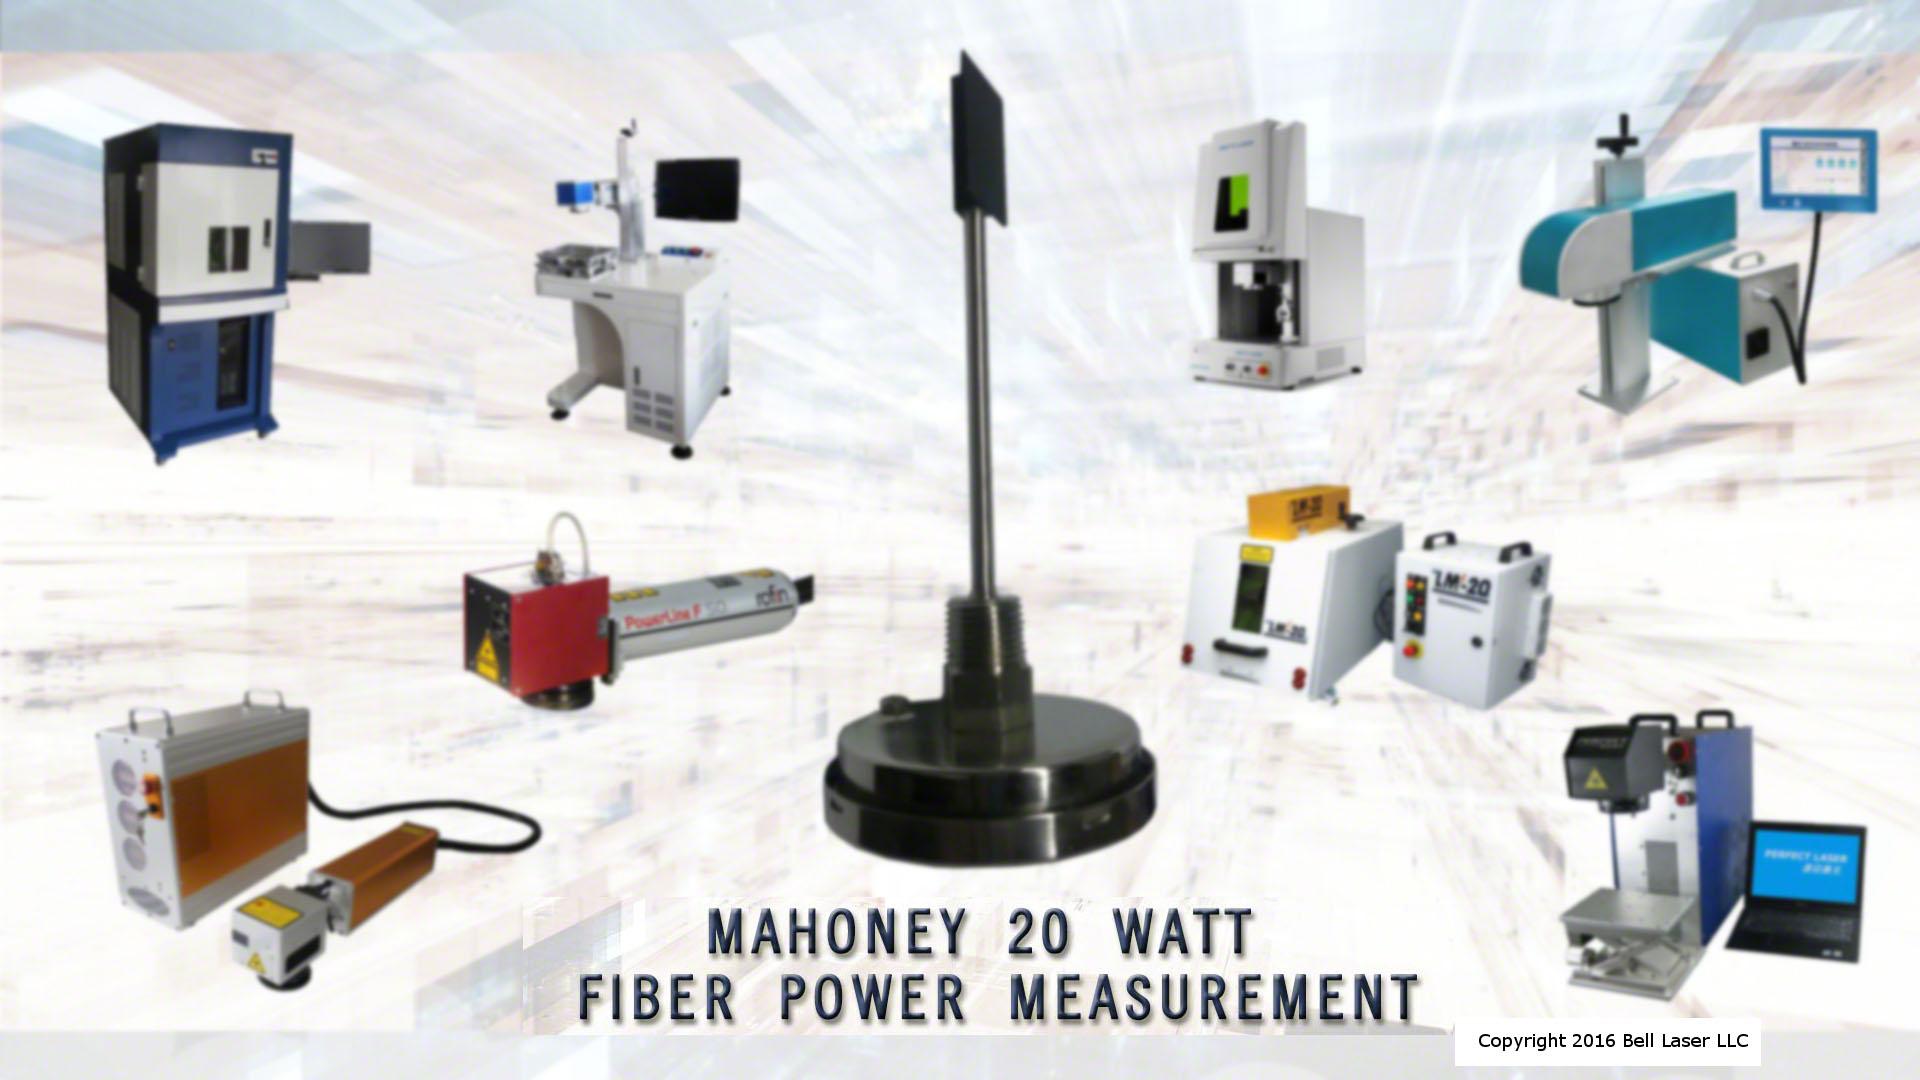 fiver_laser_machines_20_watt_Mahoney_final